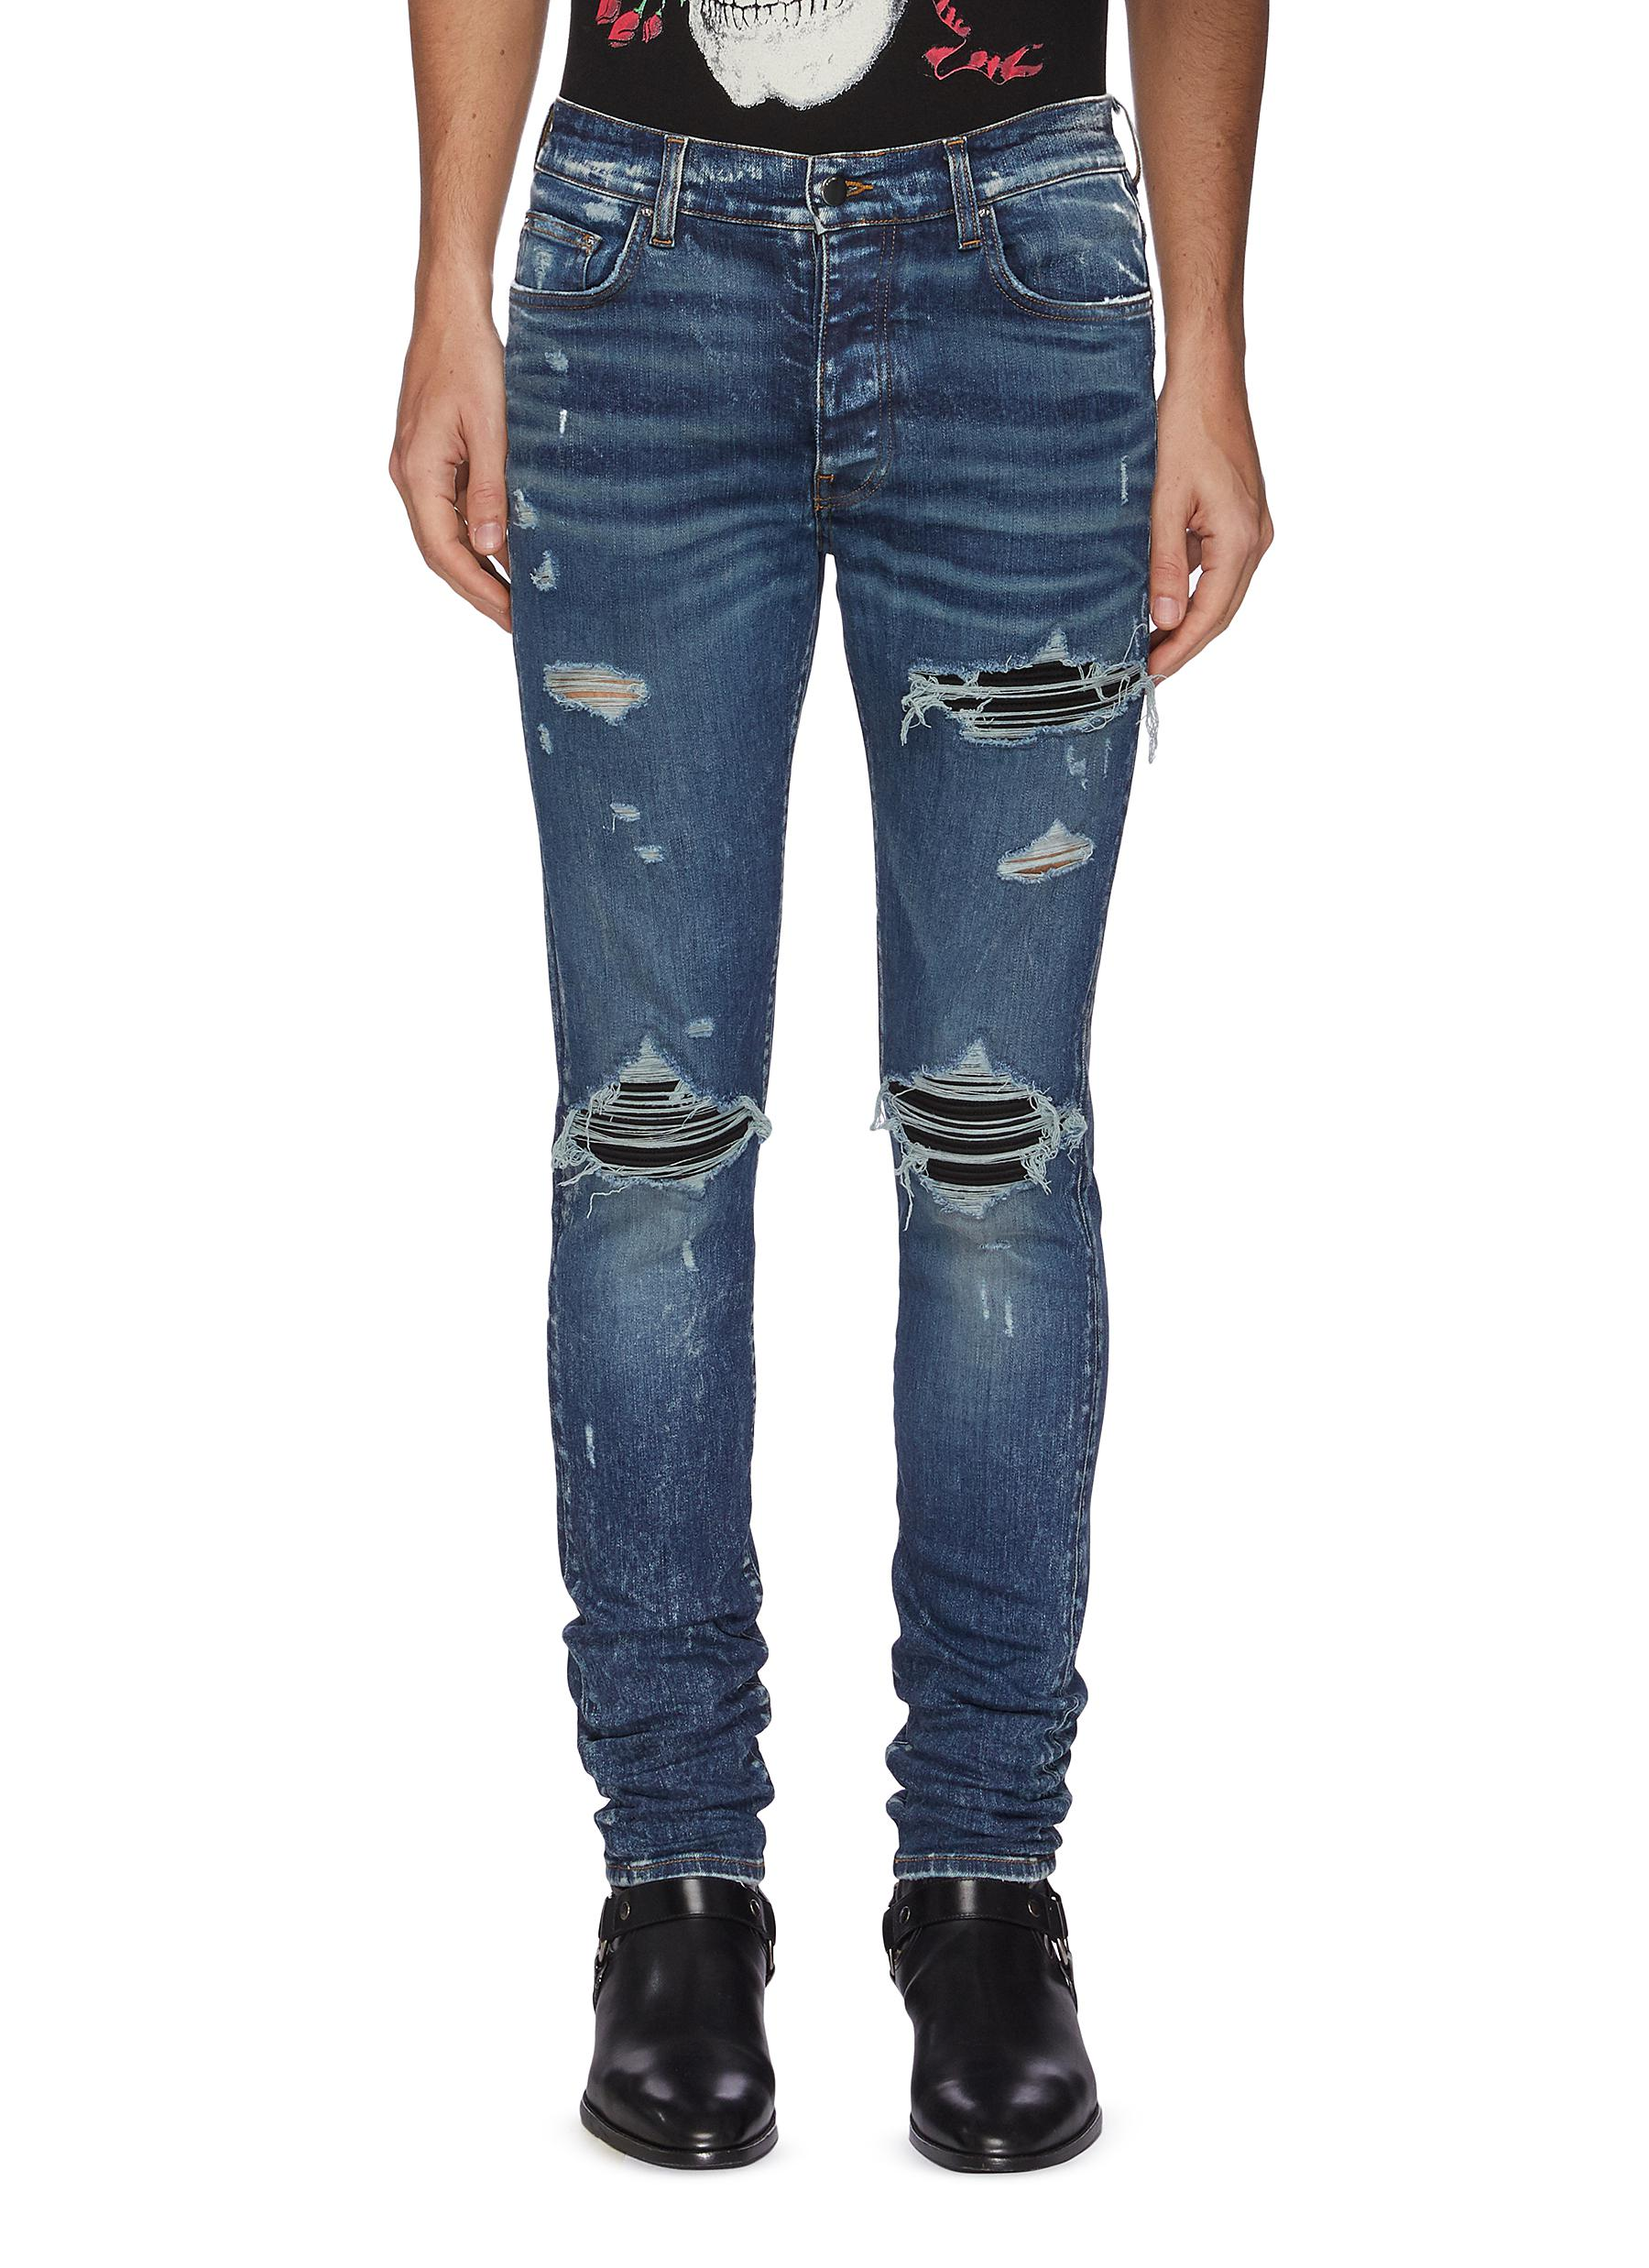 MX1' distressed jeans